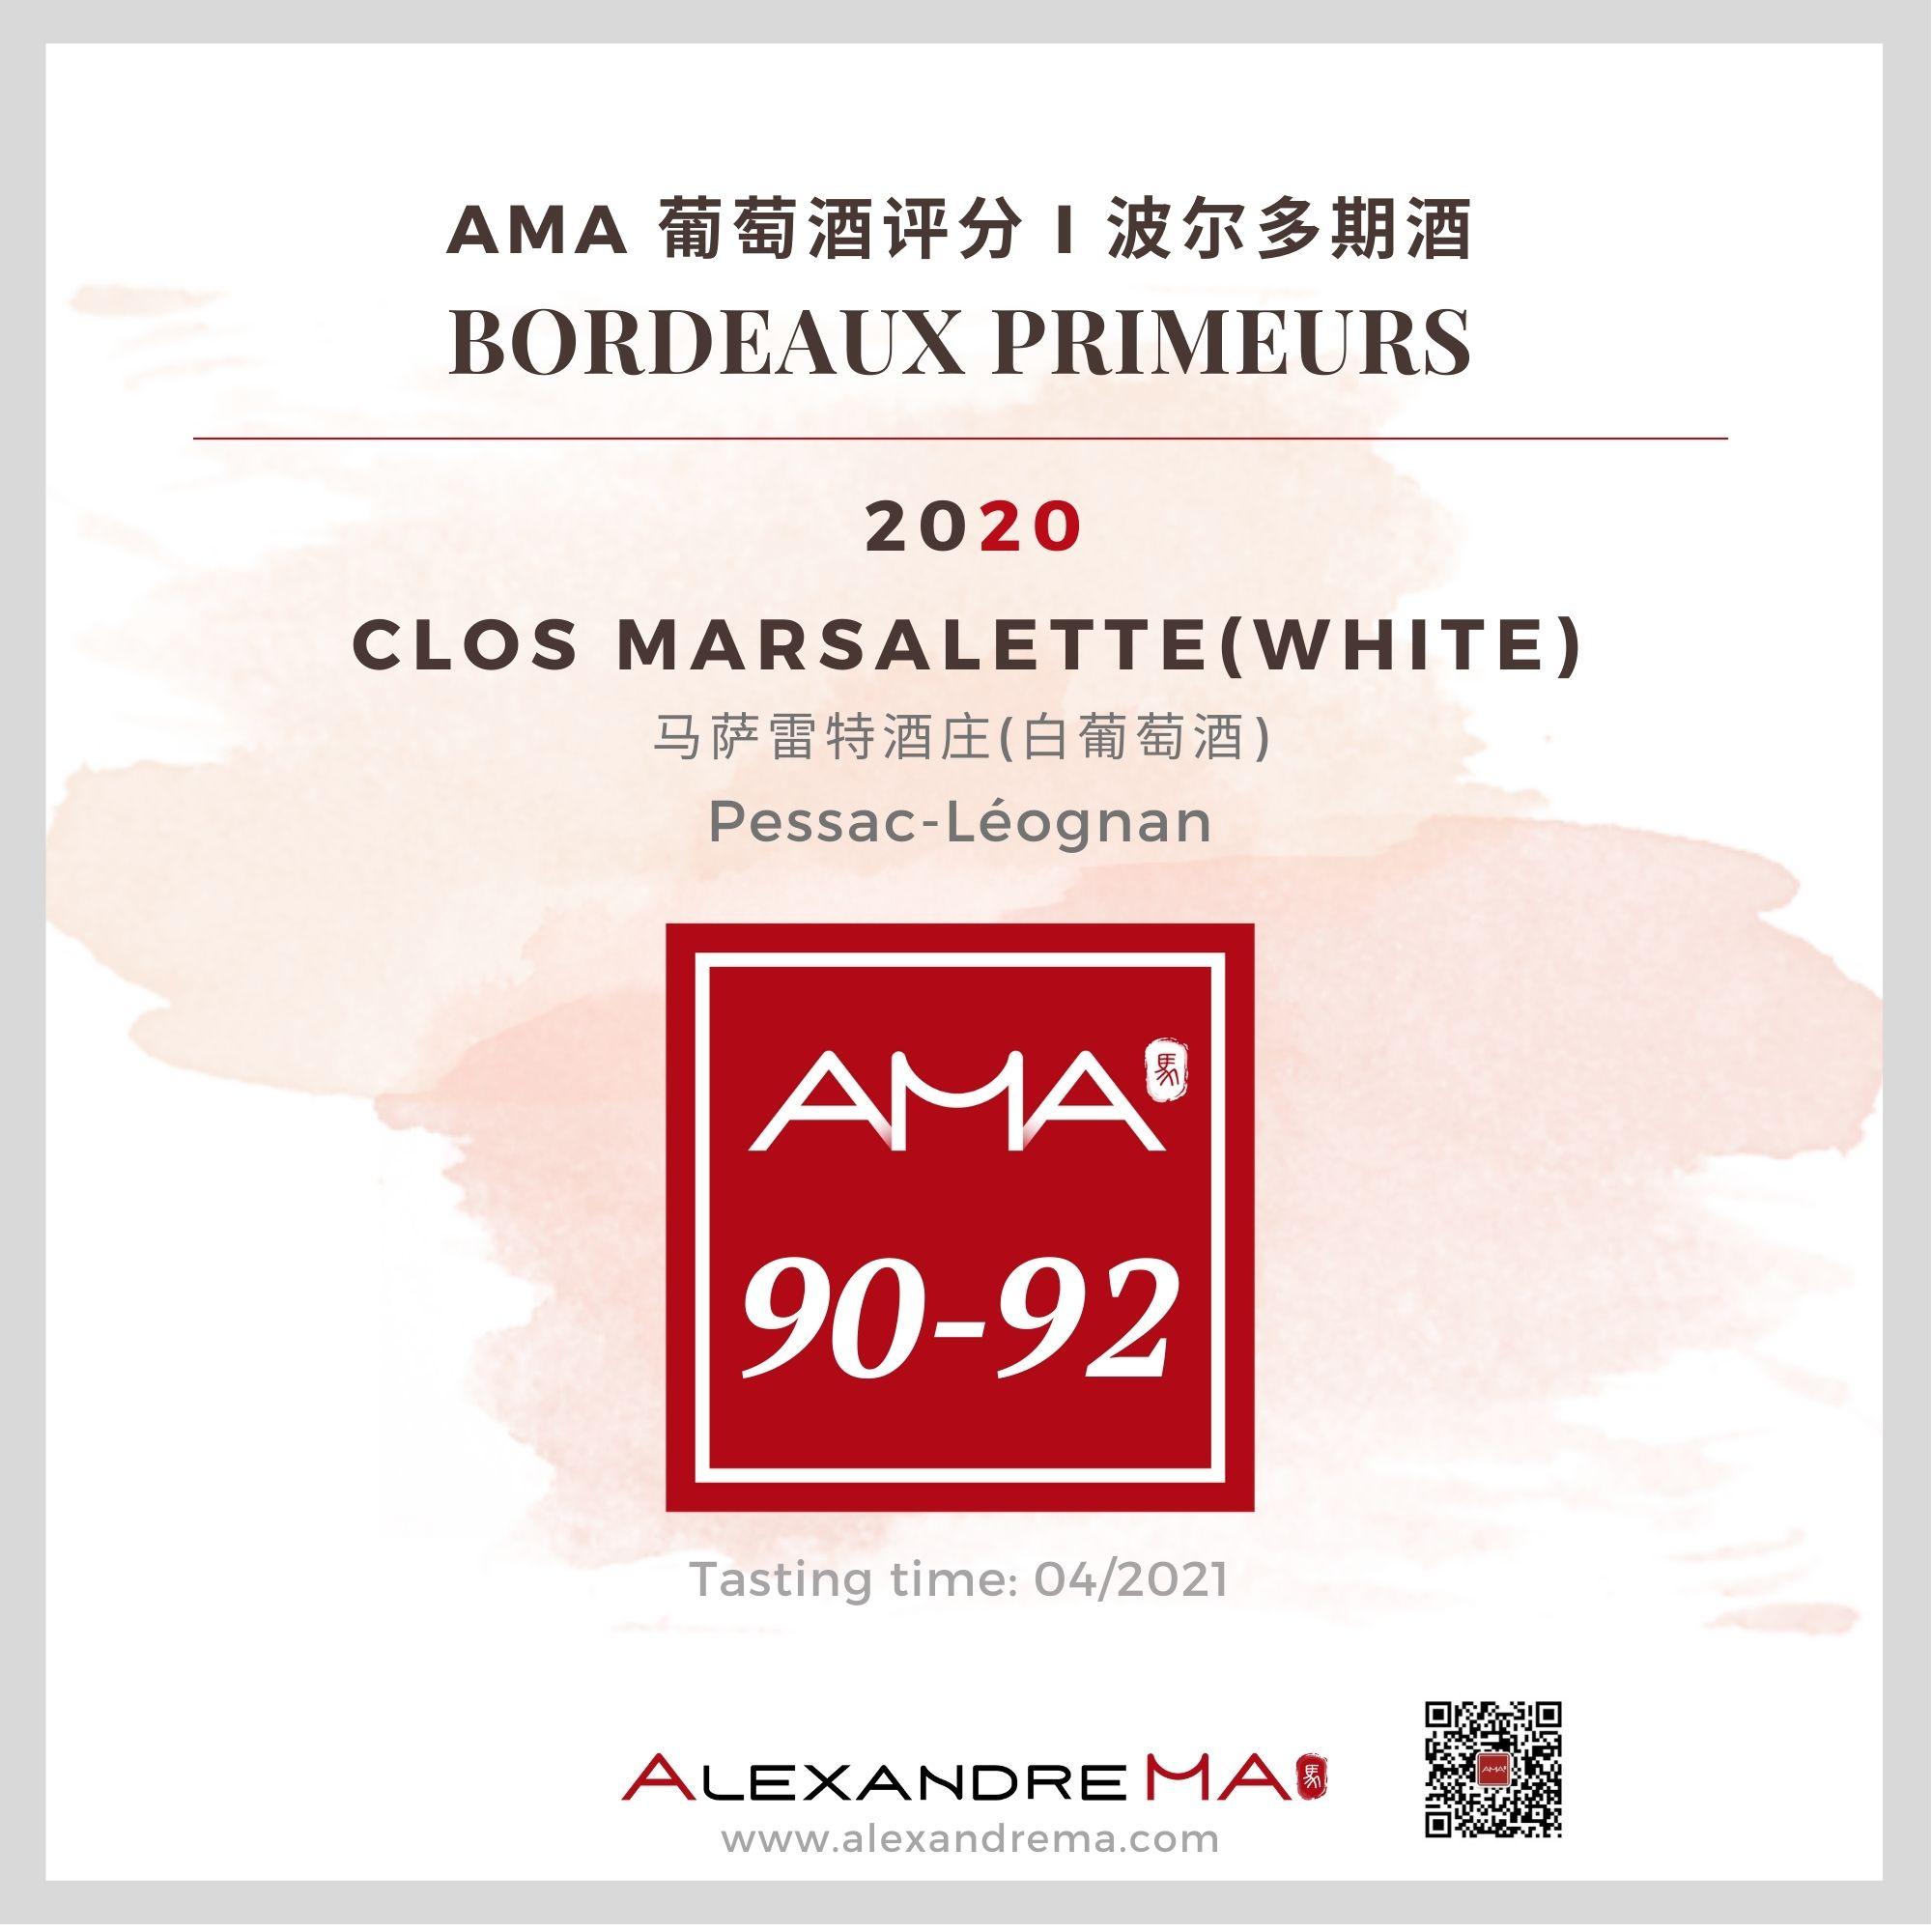 Clos Marsalette – White – 2020 - Alexandre MA